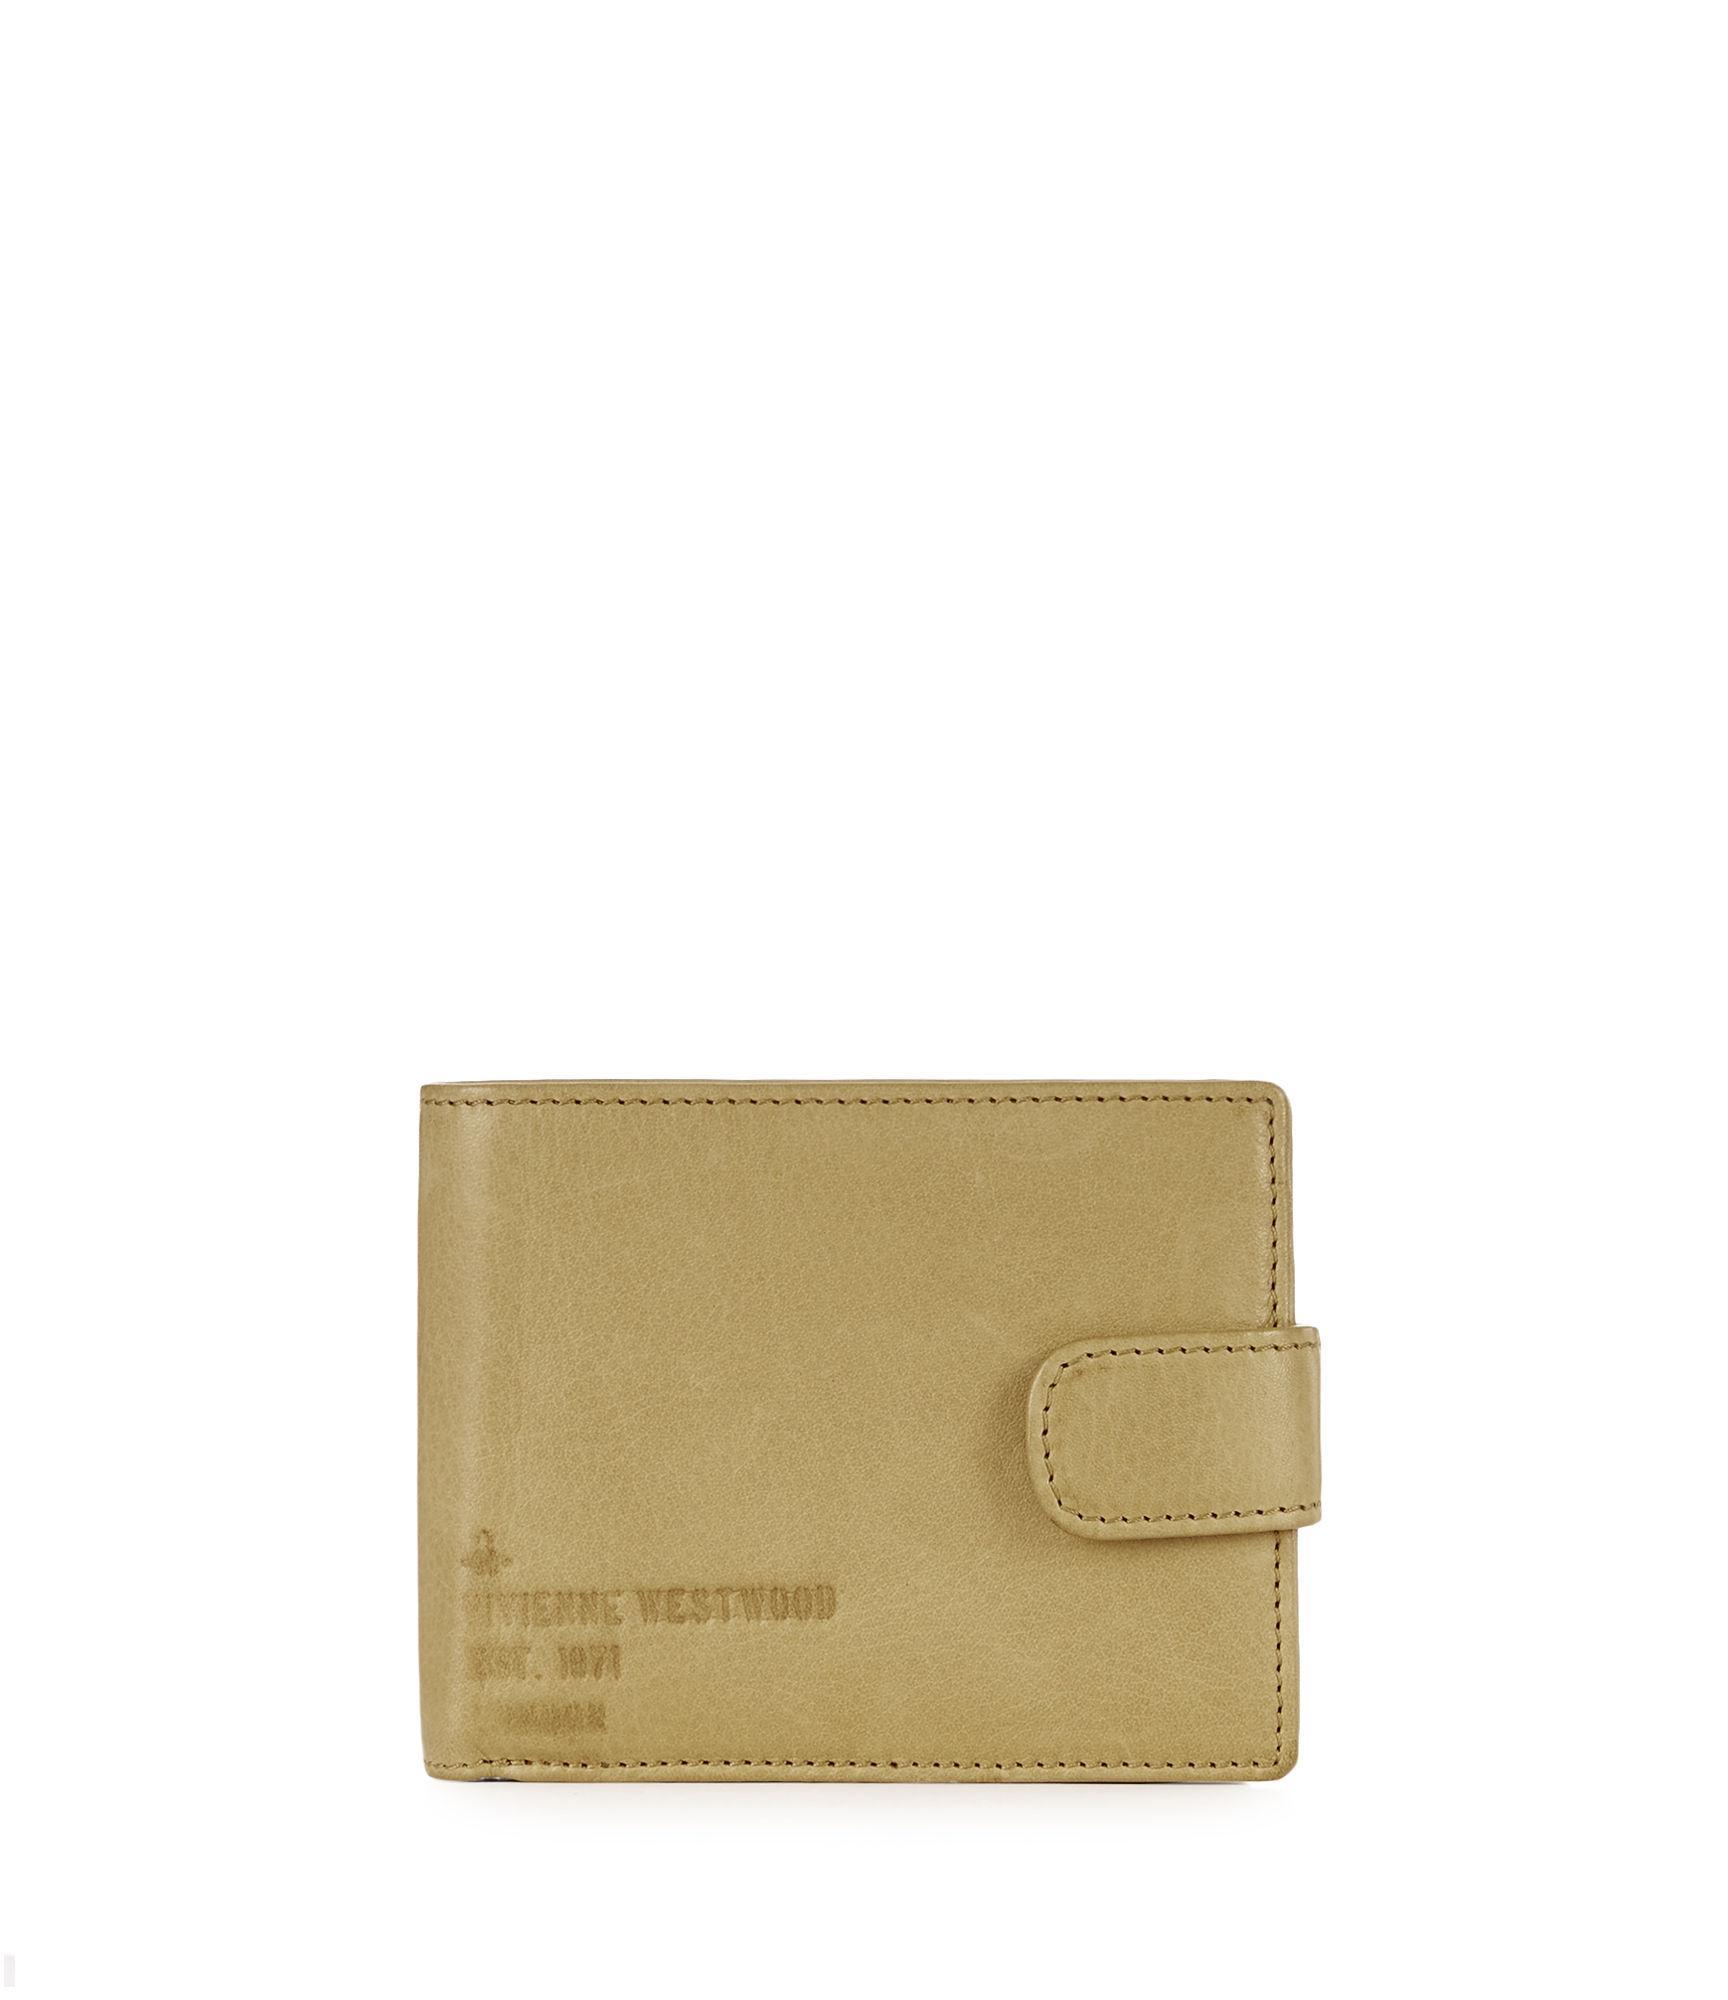 0466131a4e7 Vivienne Westwood Heath Wallet With Flap 51090012 Tan   ModeSens